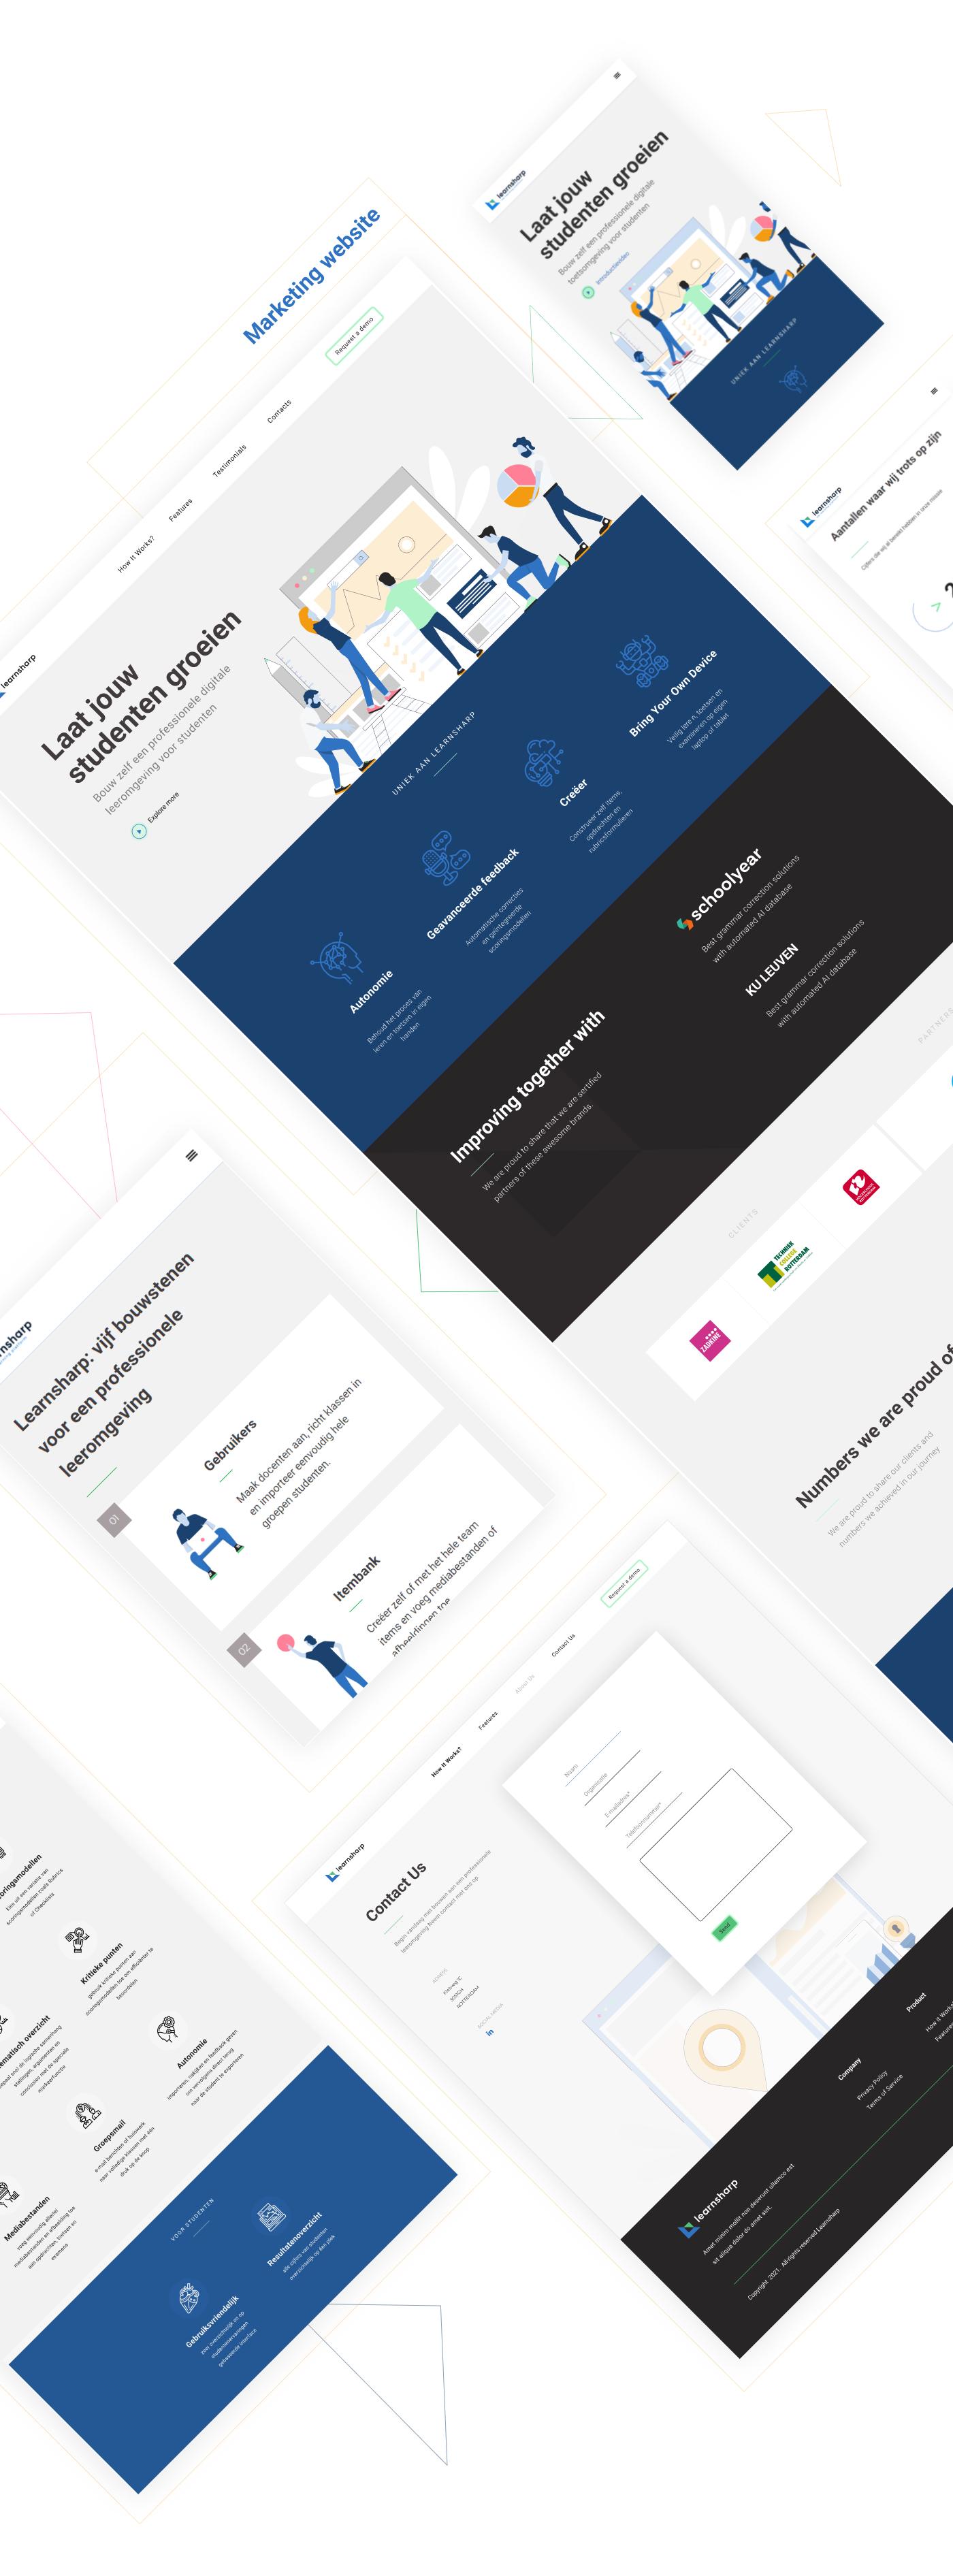 education startup Educational Product Identity System learning platform Logo Design Product Branding startup identity tech startup UX UI Webflow